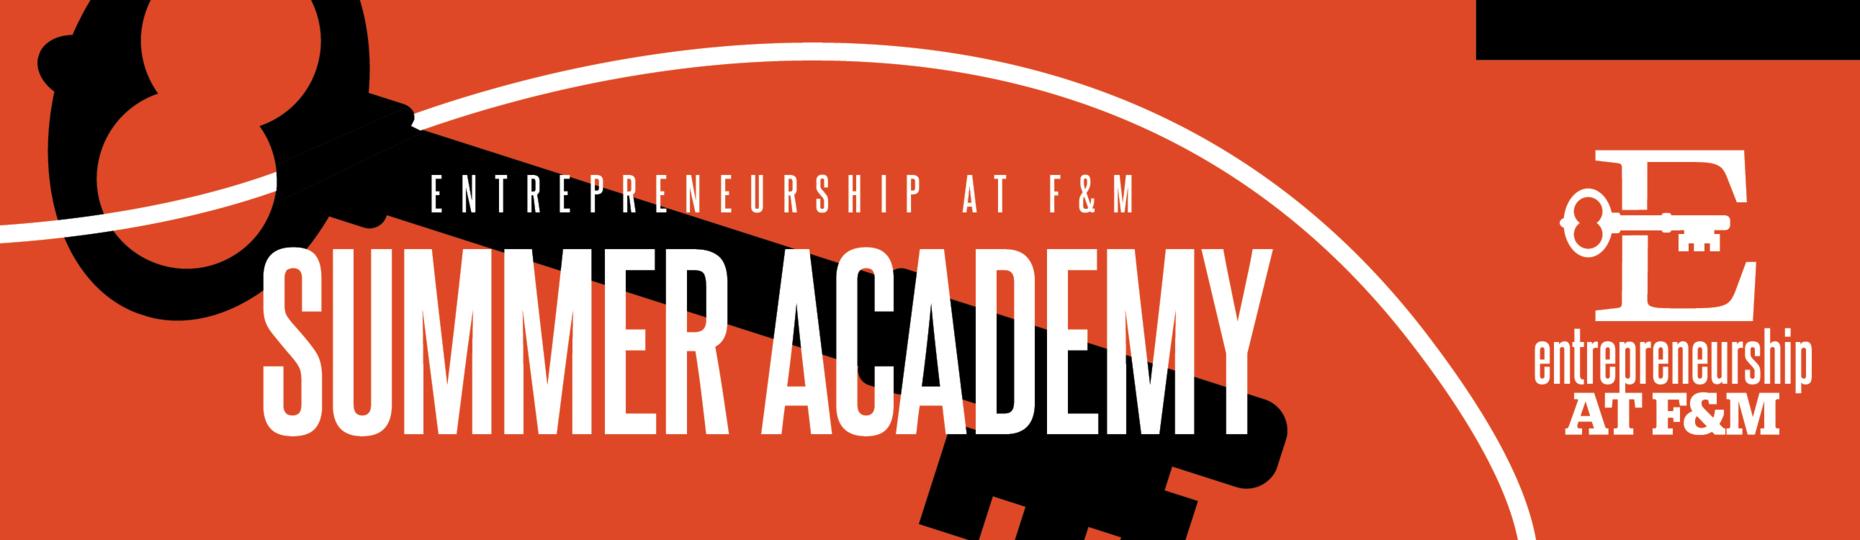 entrepreneurship academy graphic